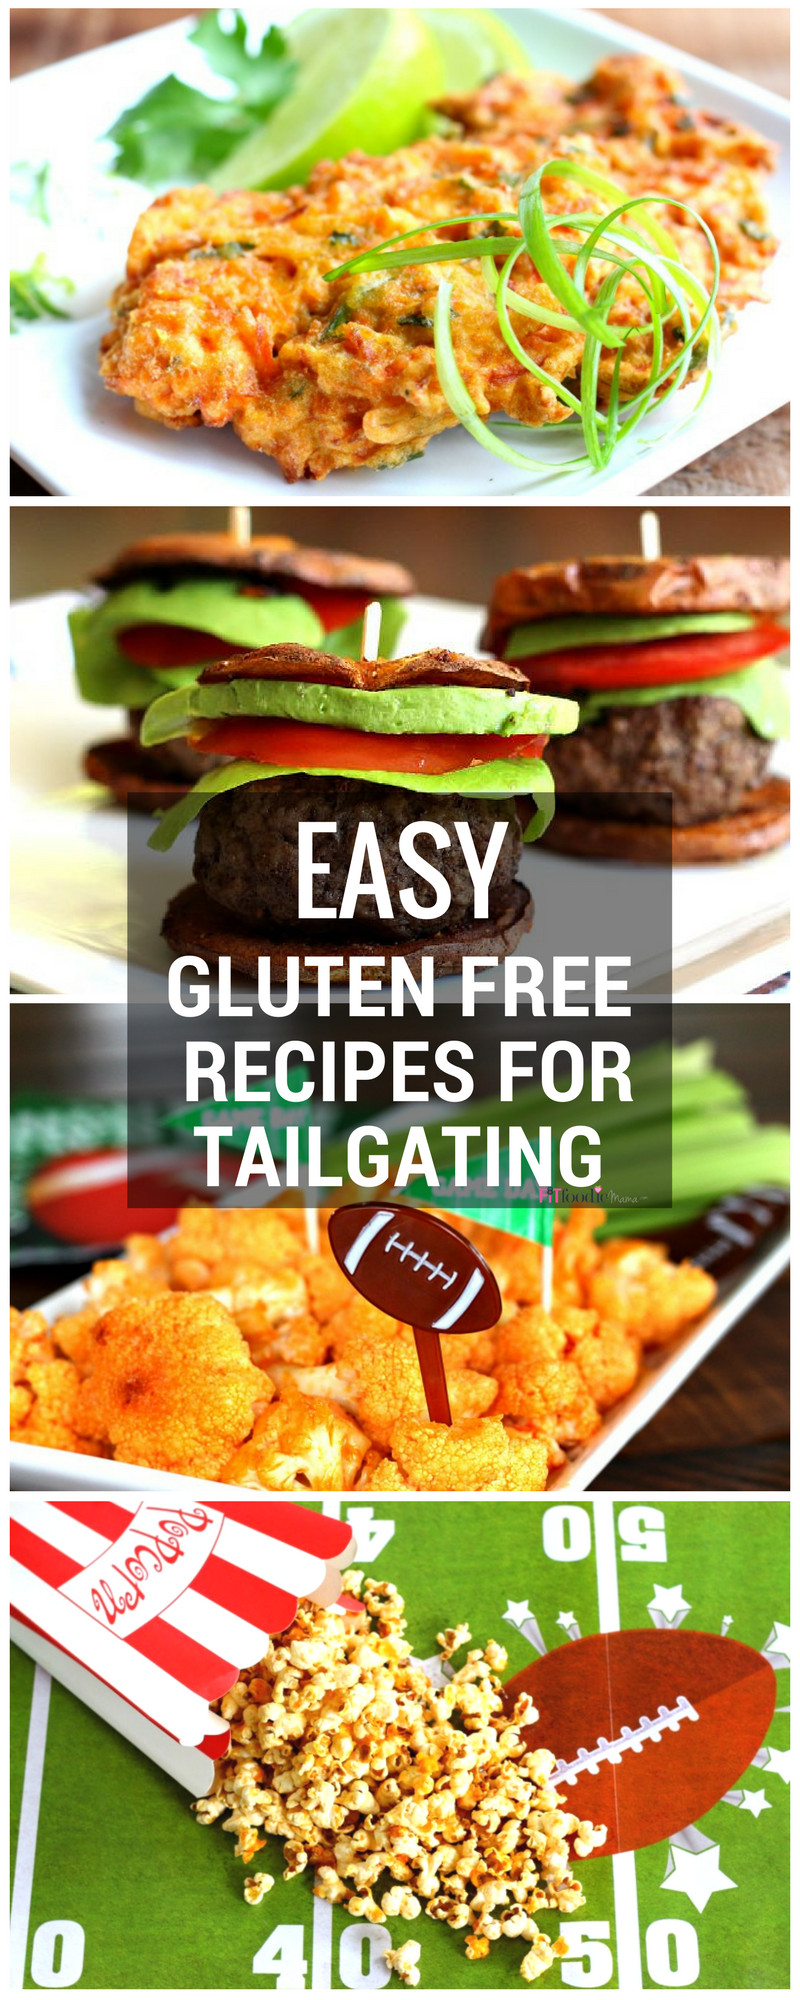 Dairy Free Recipes Easy  Easy Gluten Free Tailgating Recipes for Football Season